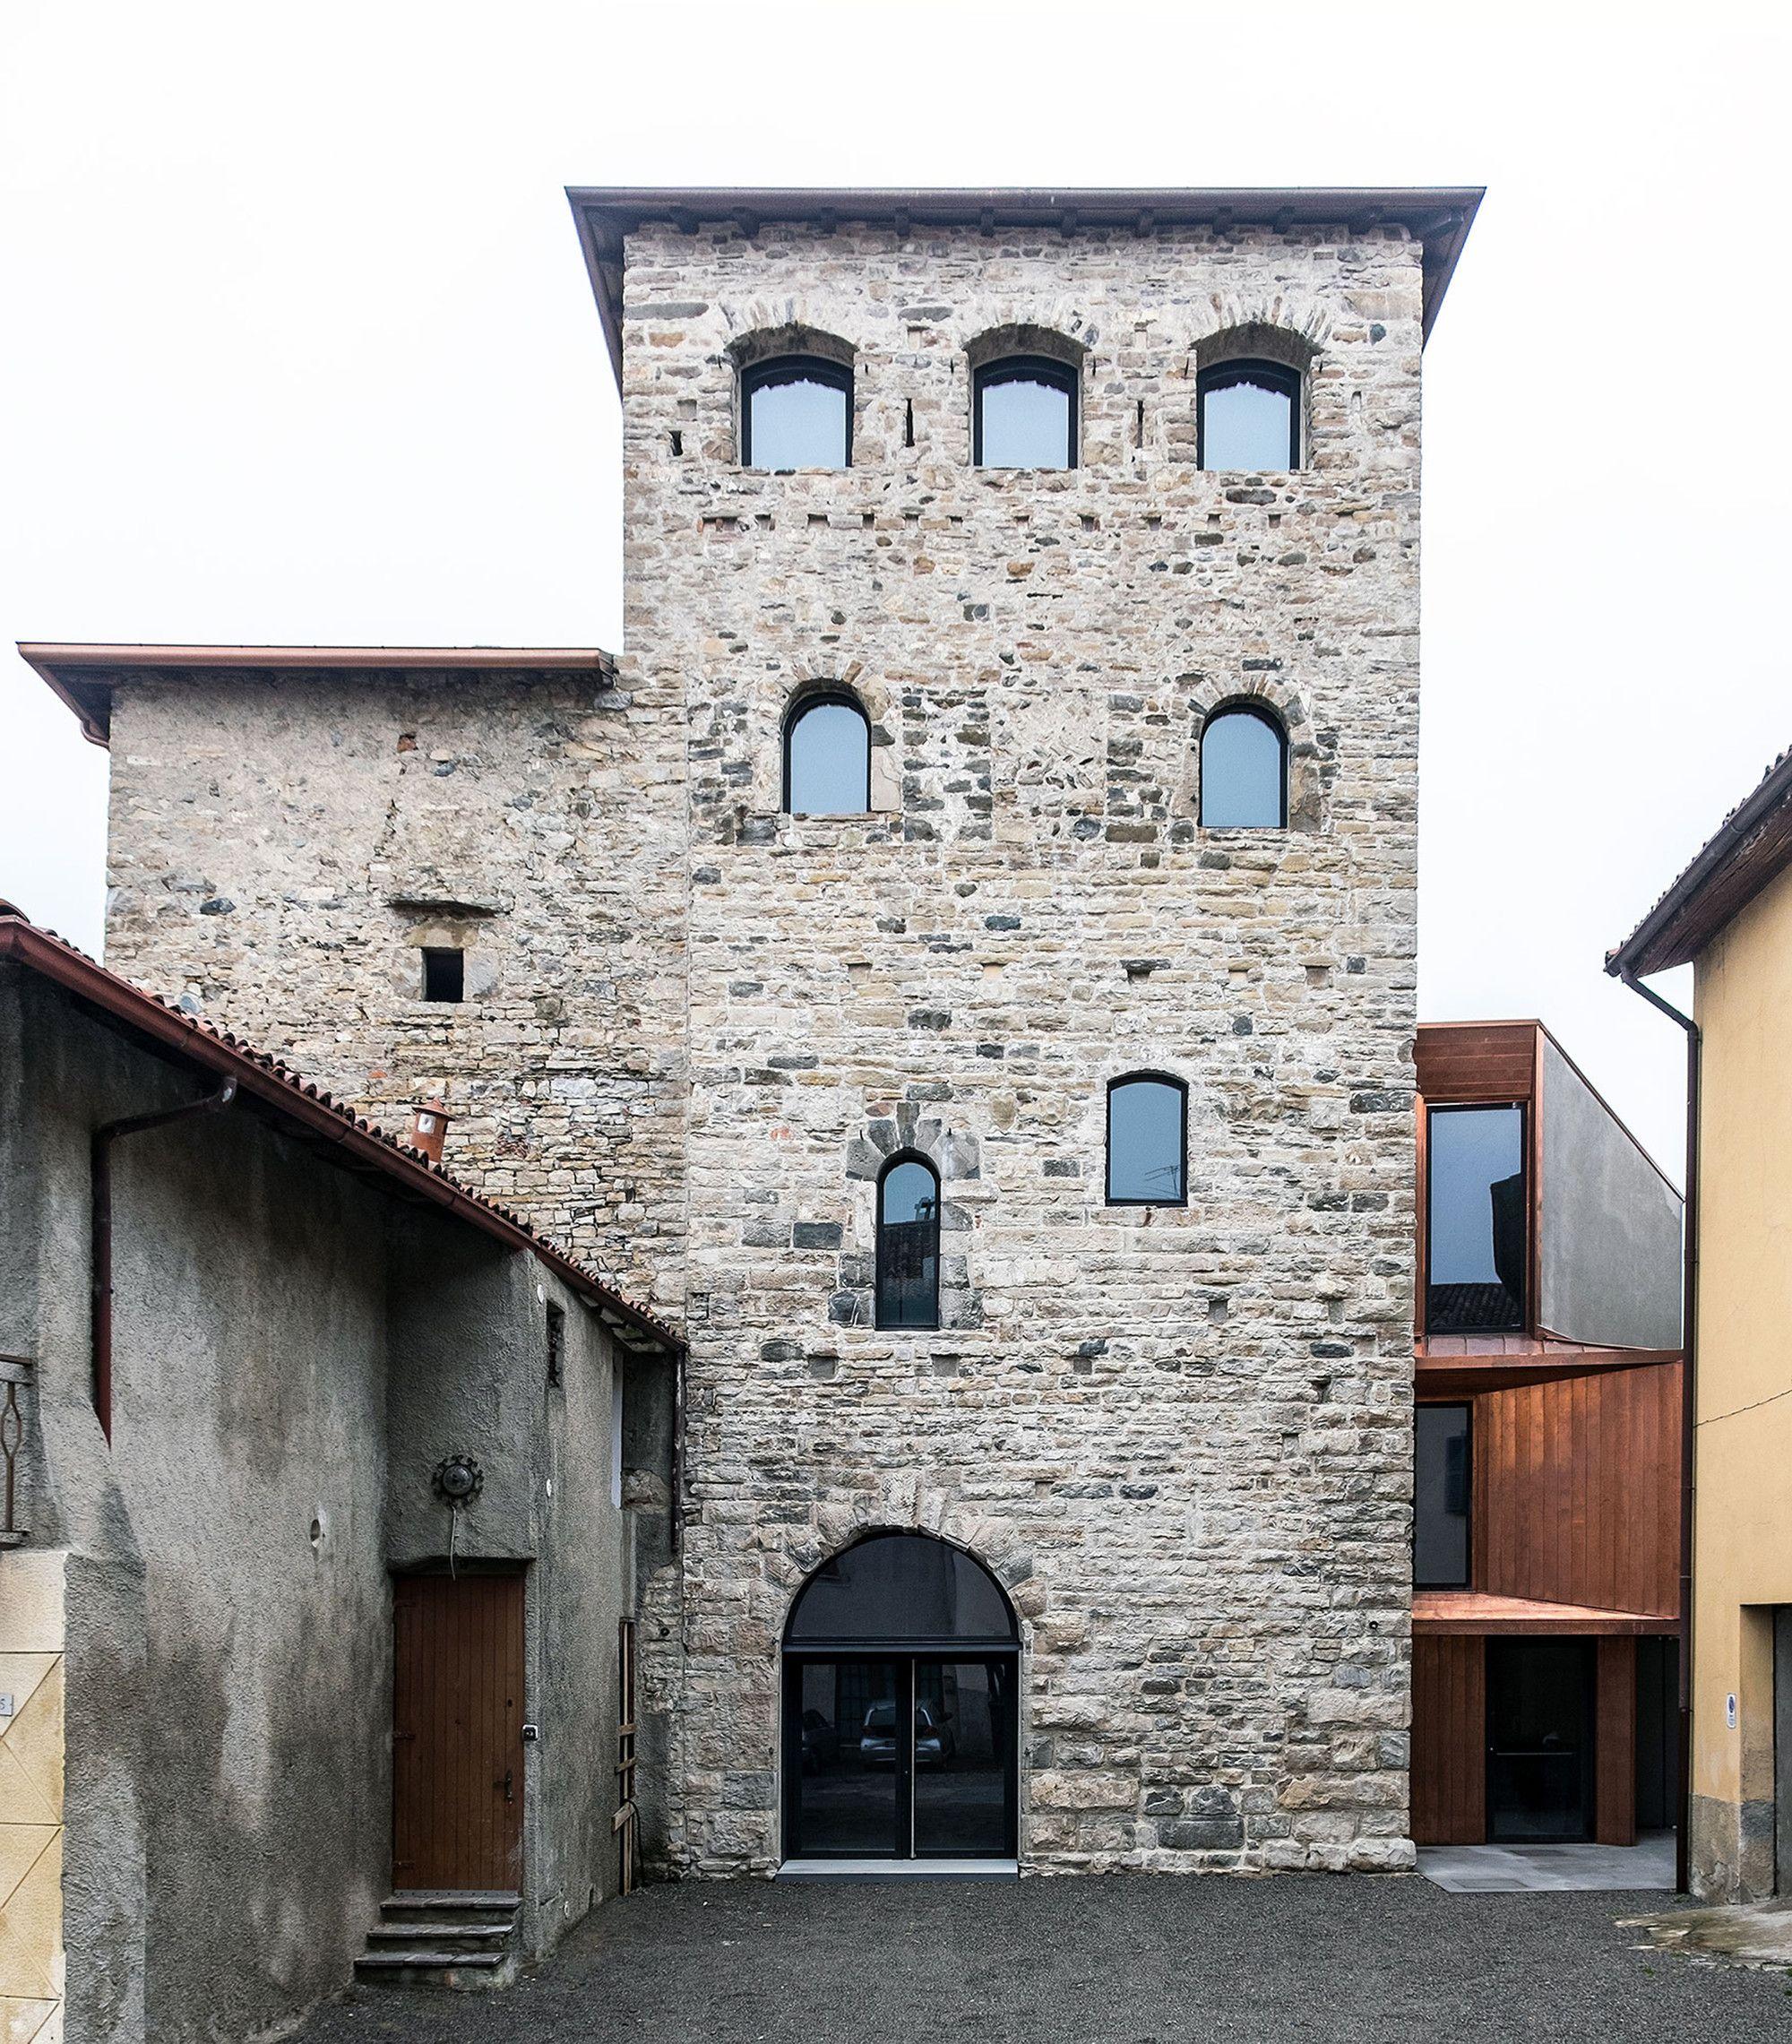 Galeria de Torre del Borgo / Gianluca Gelmini - 7